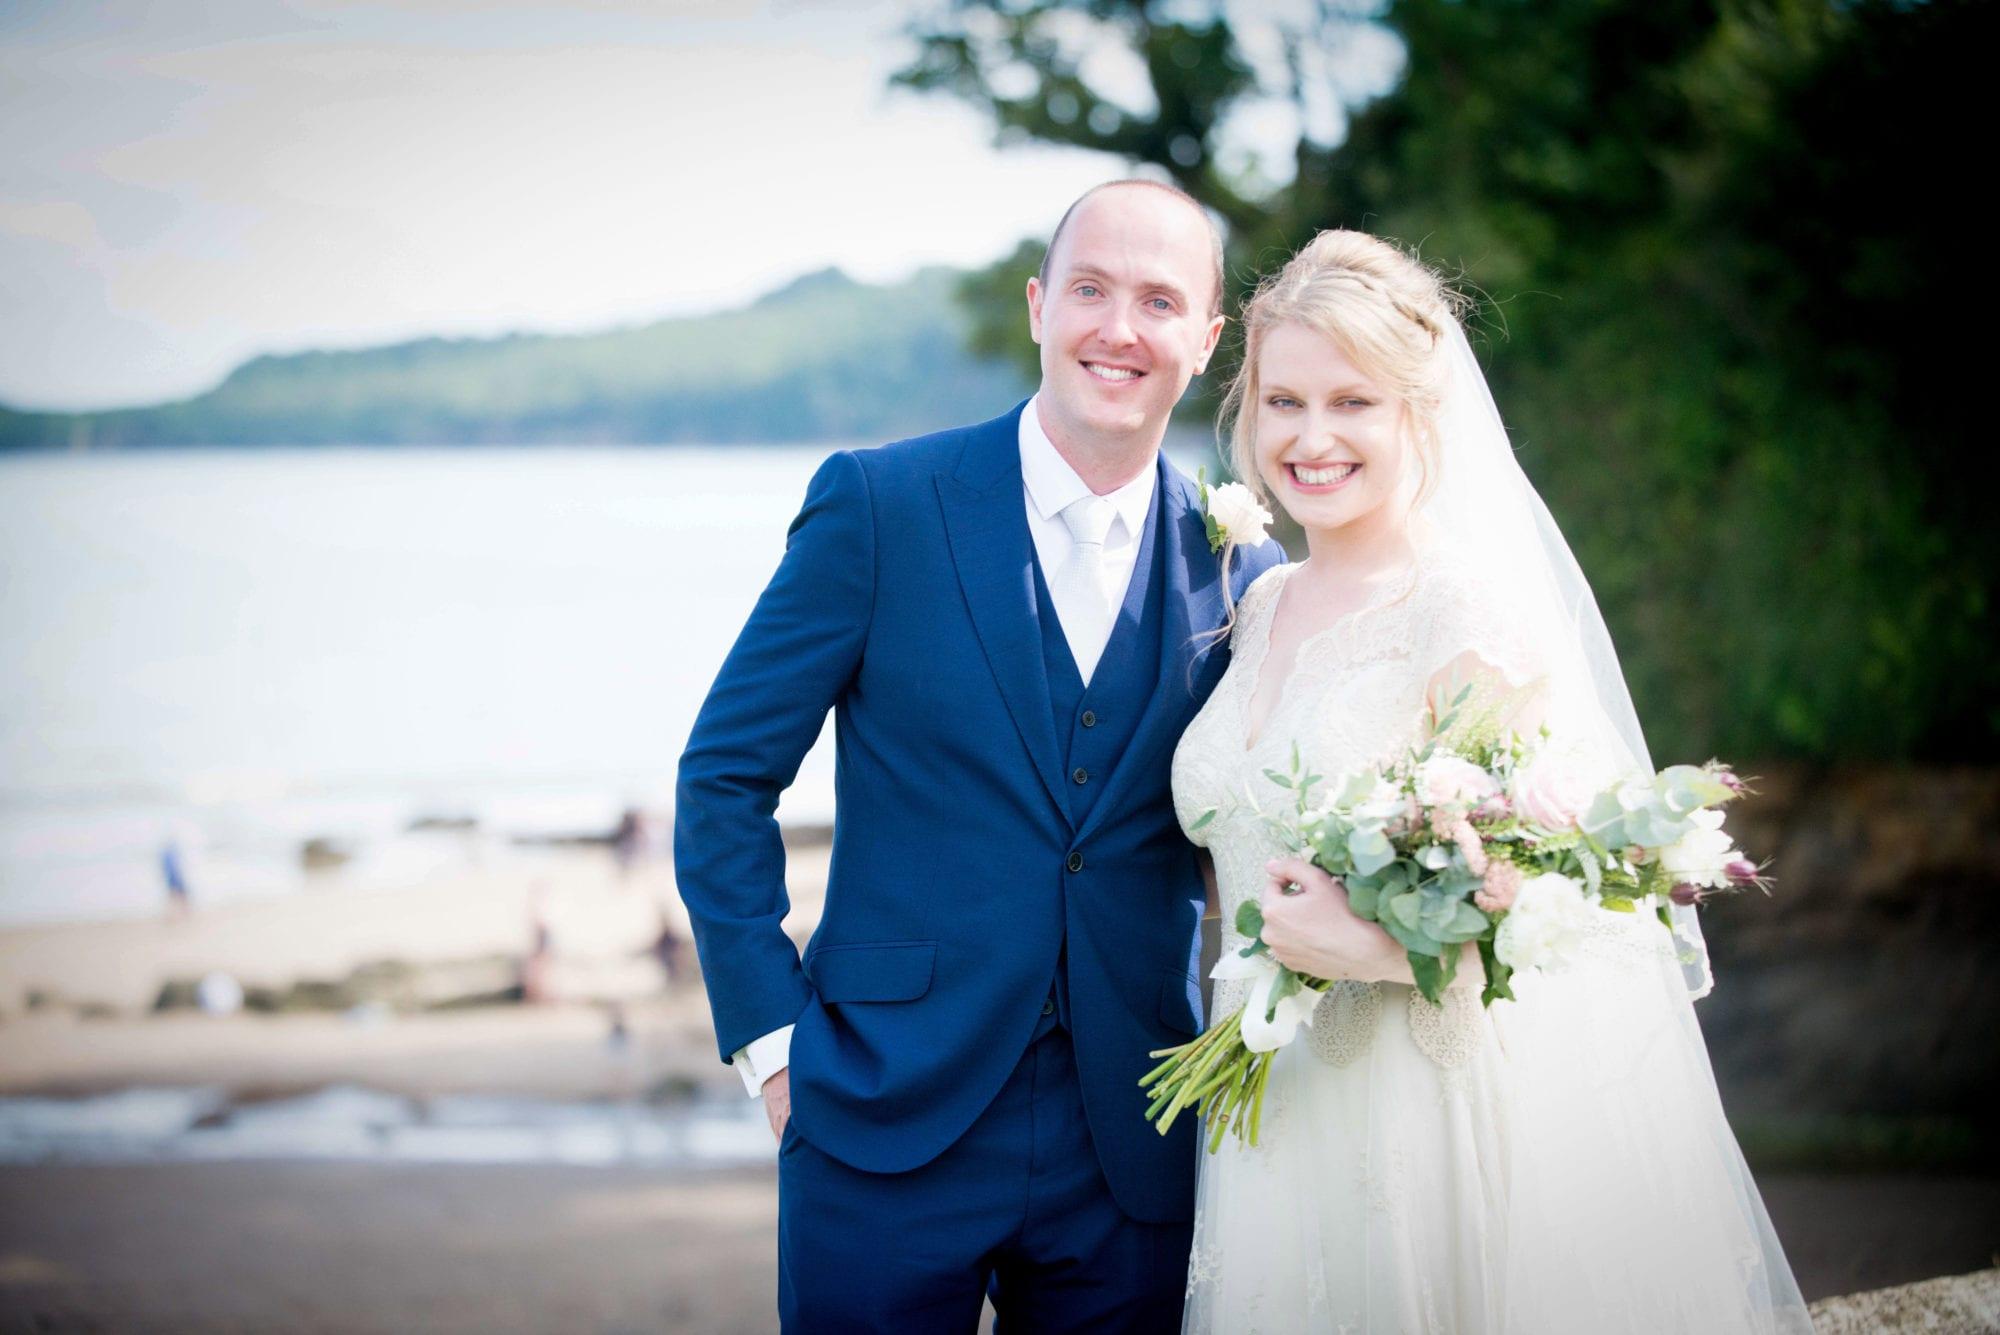 Lochlan and Charlotte – an Ethica Diamonds wedding!